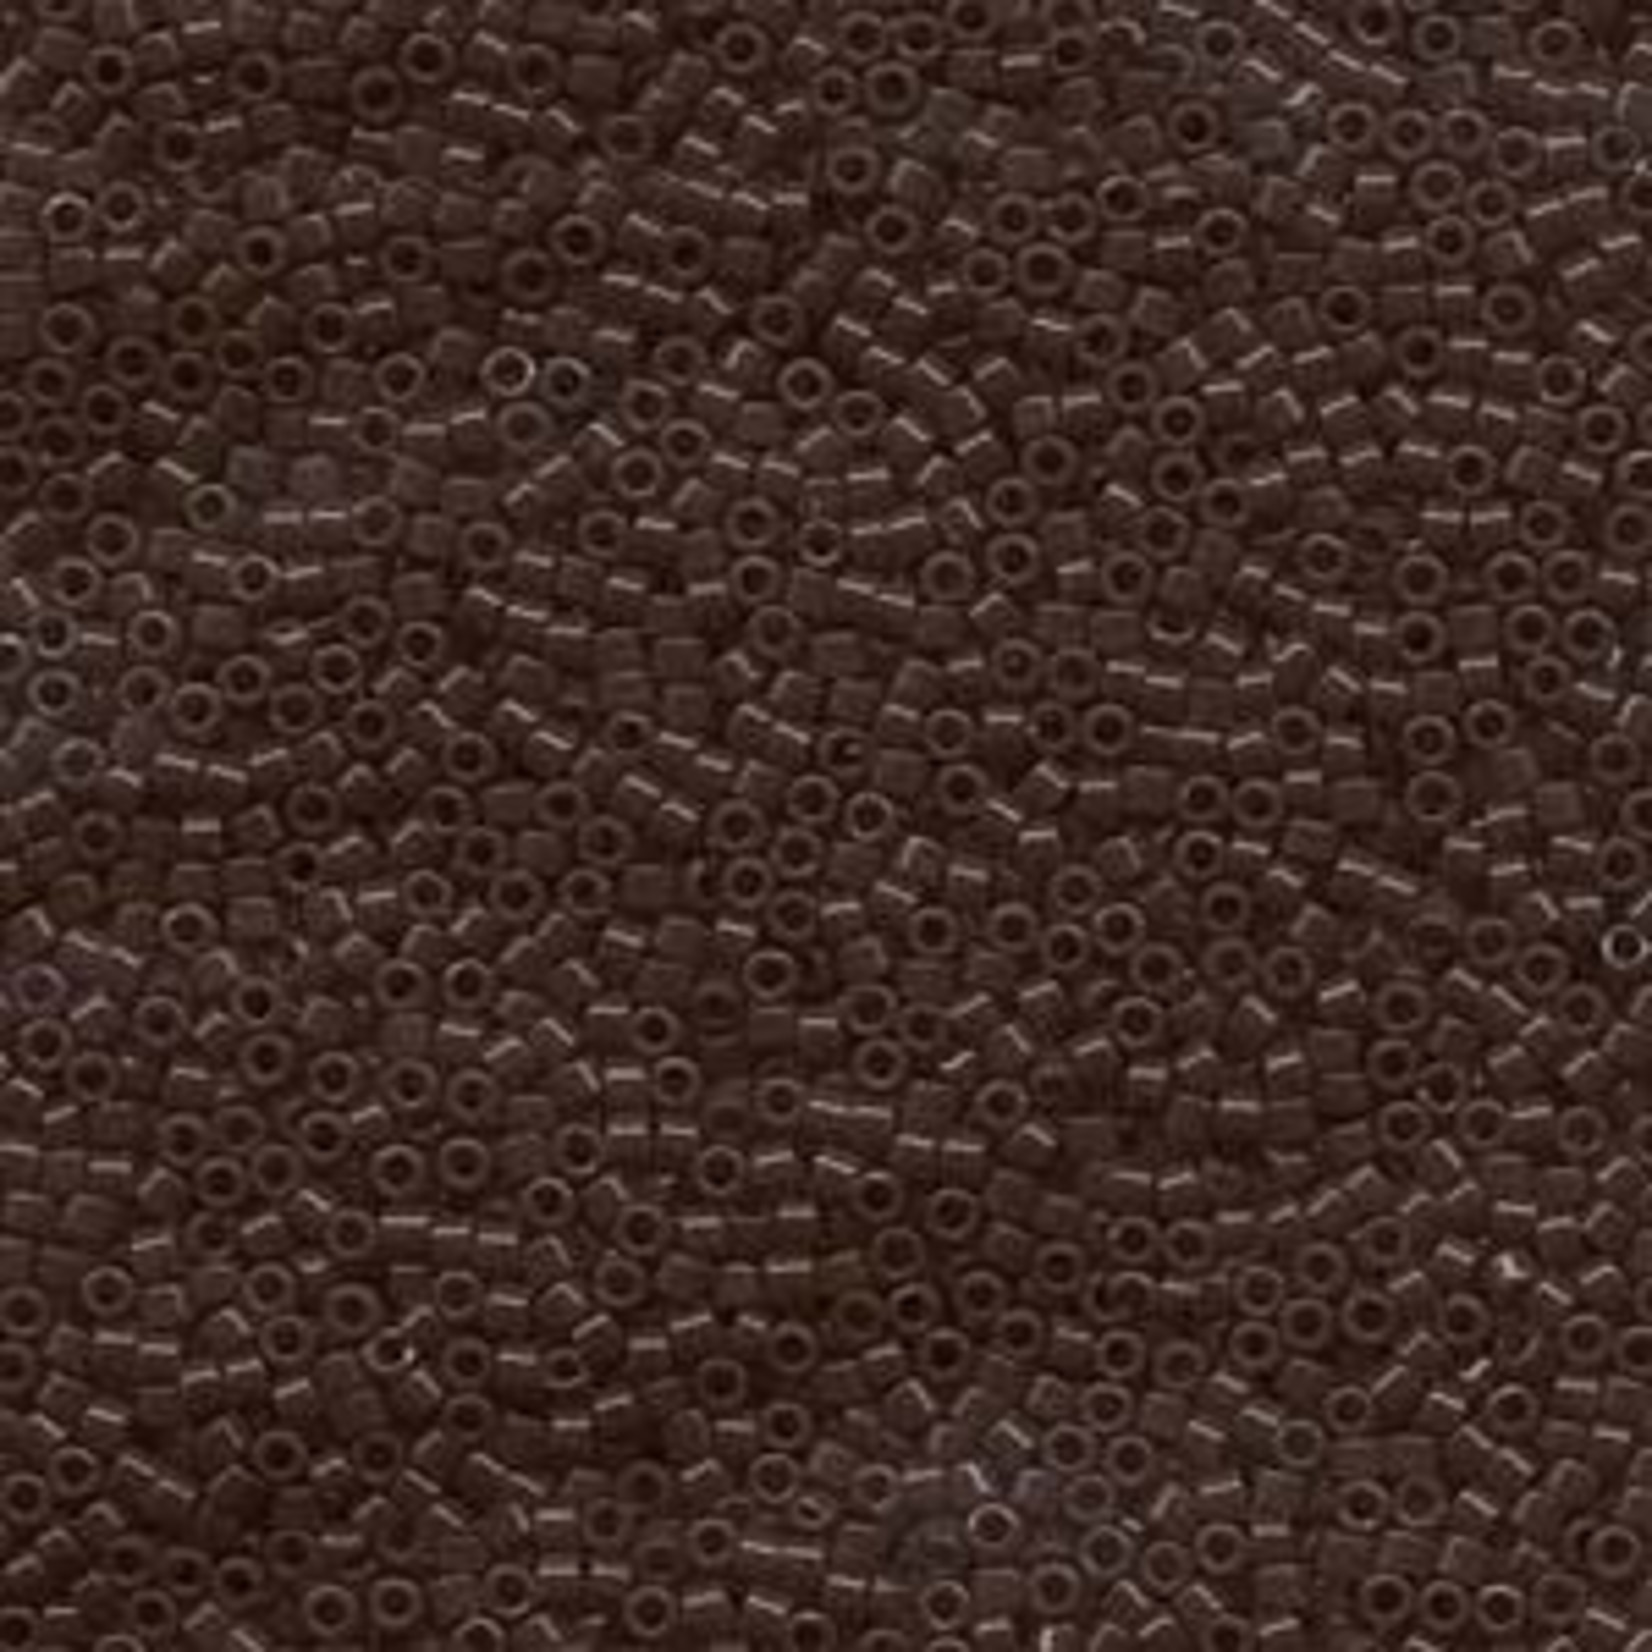 Miyuki 7.2 GM DB0734 11/0 Delica: Chocolate Brown O (APX 1400 PCS)